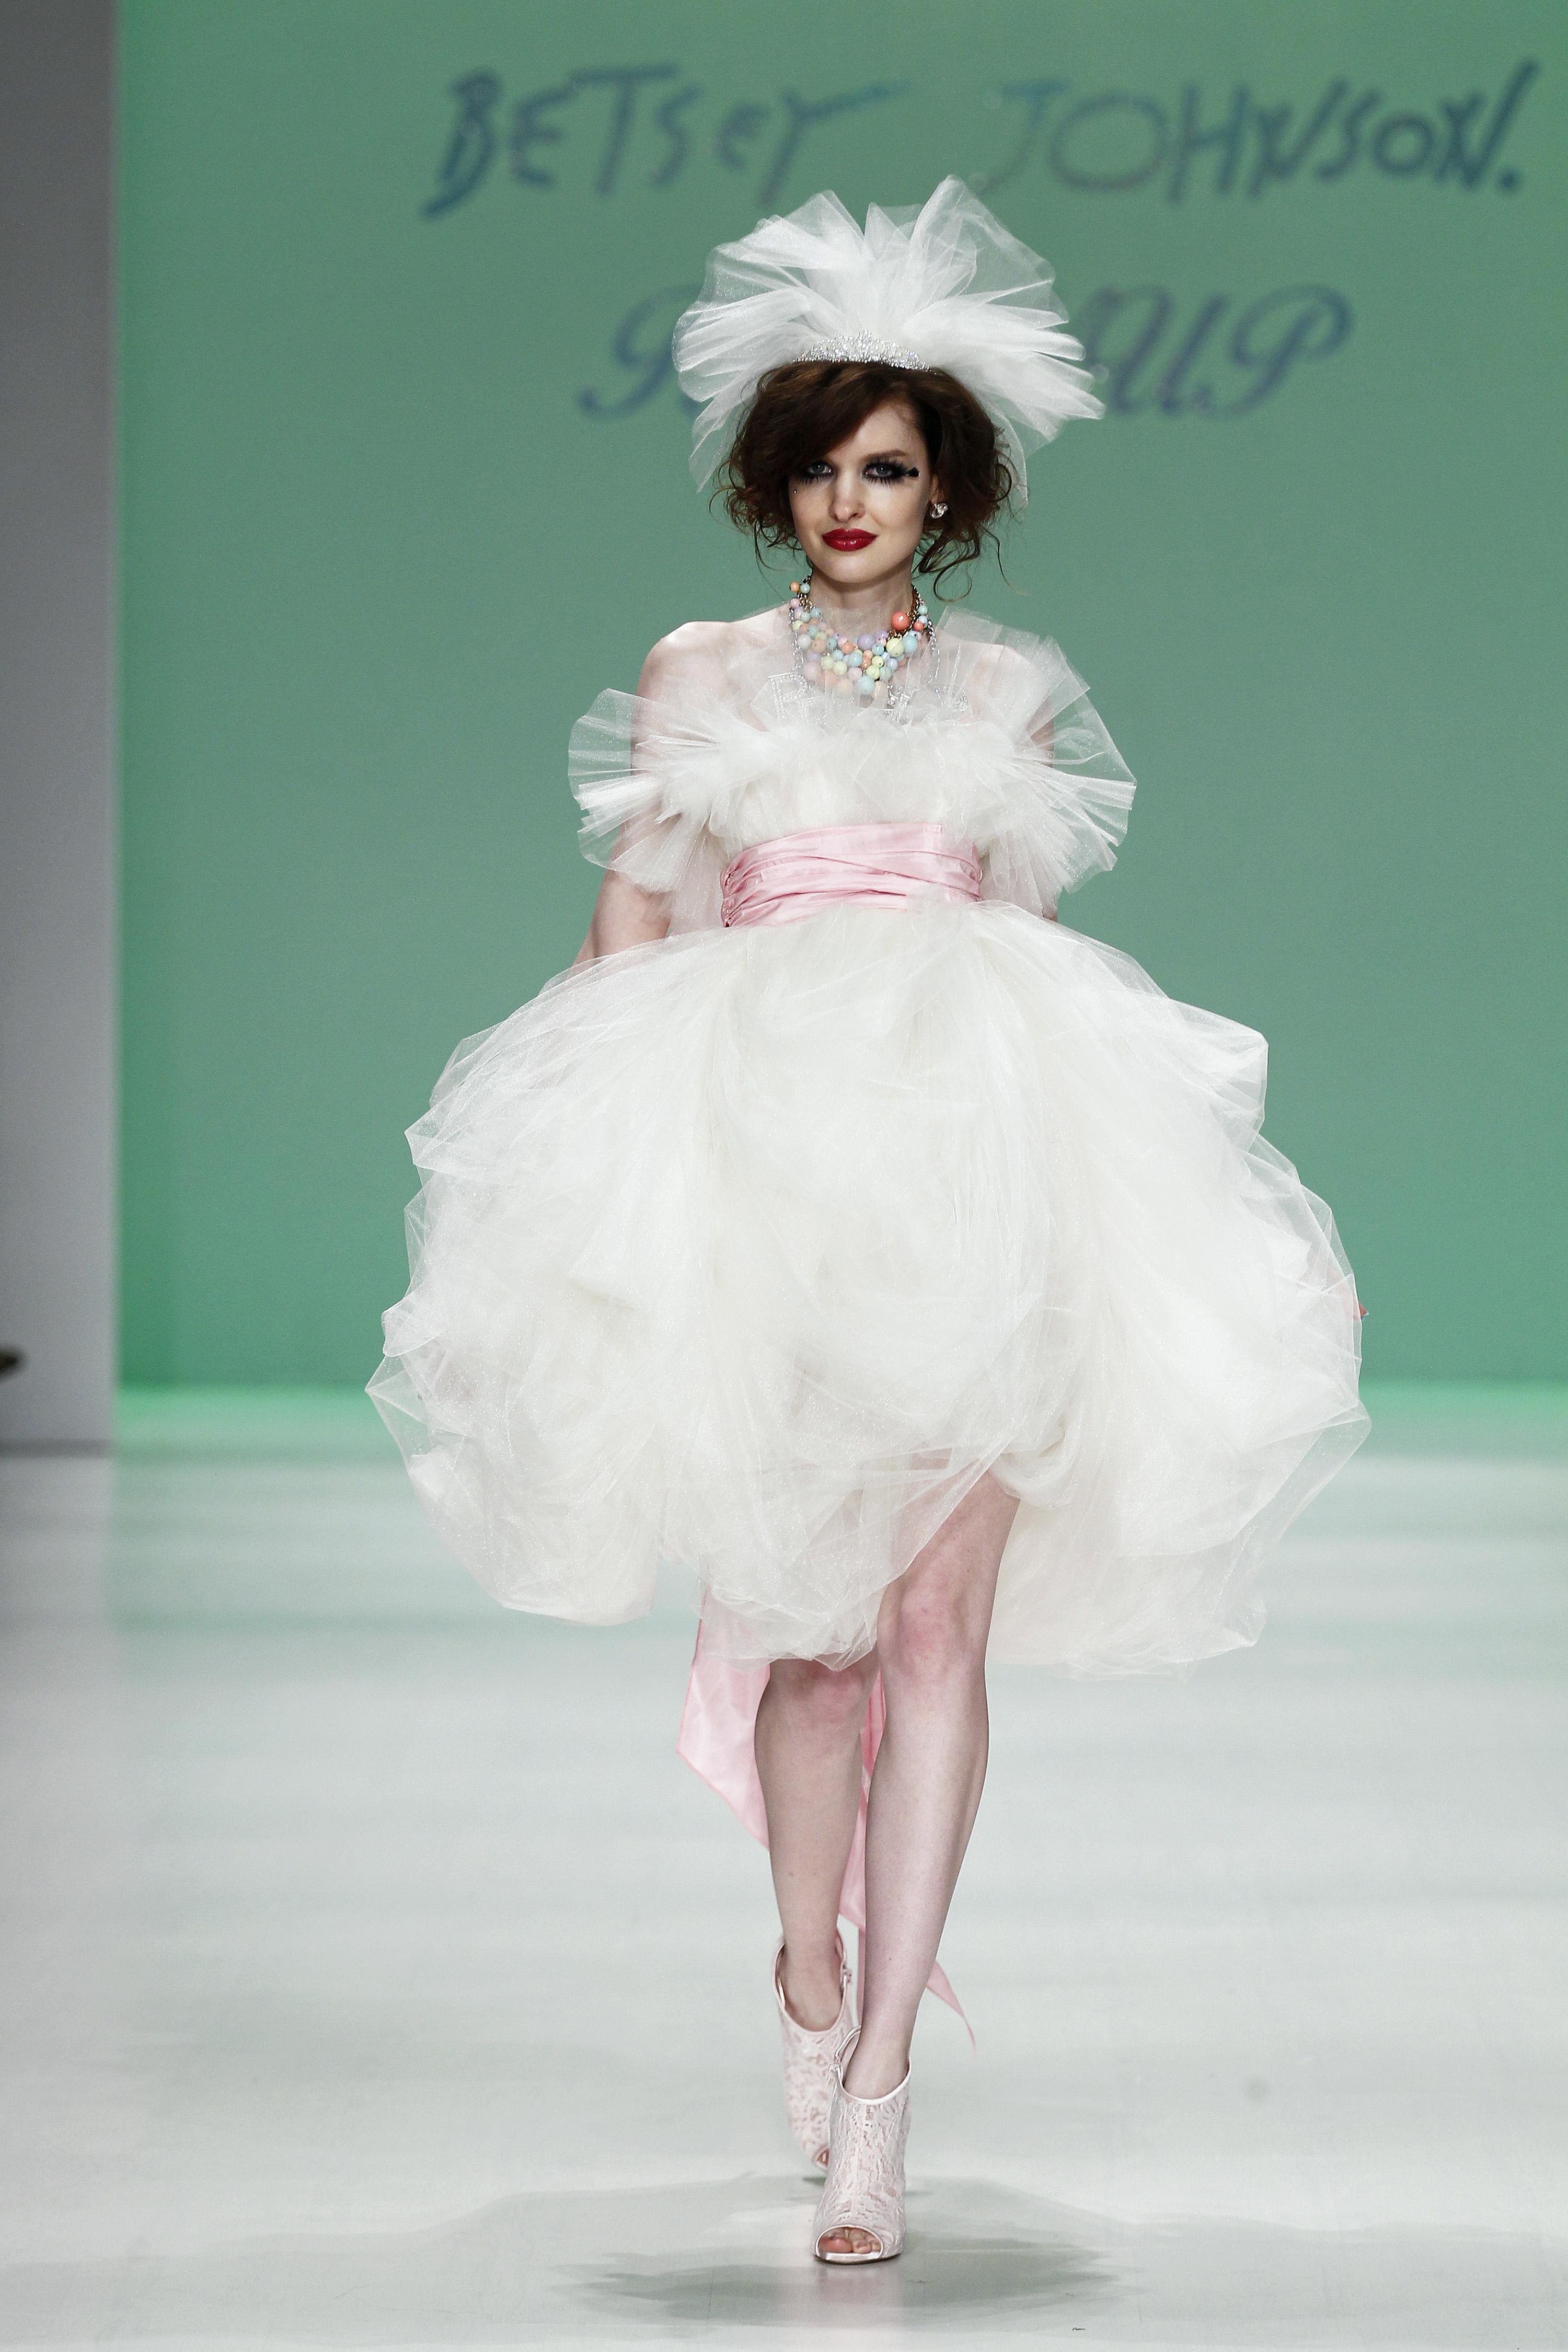 Magnificent Betsey Johnson Wedding Dress Gallery - All Wedding ...